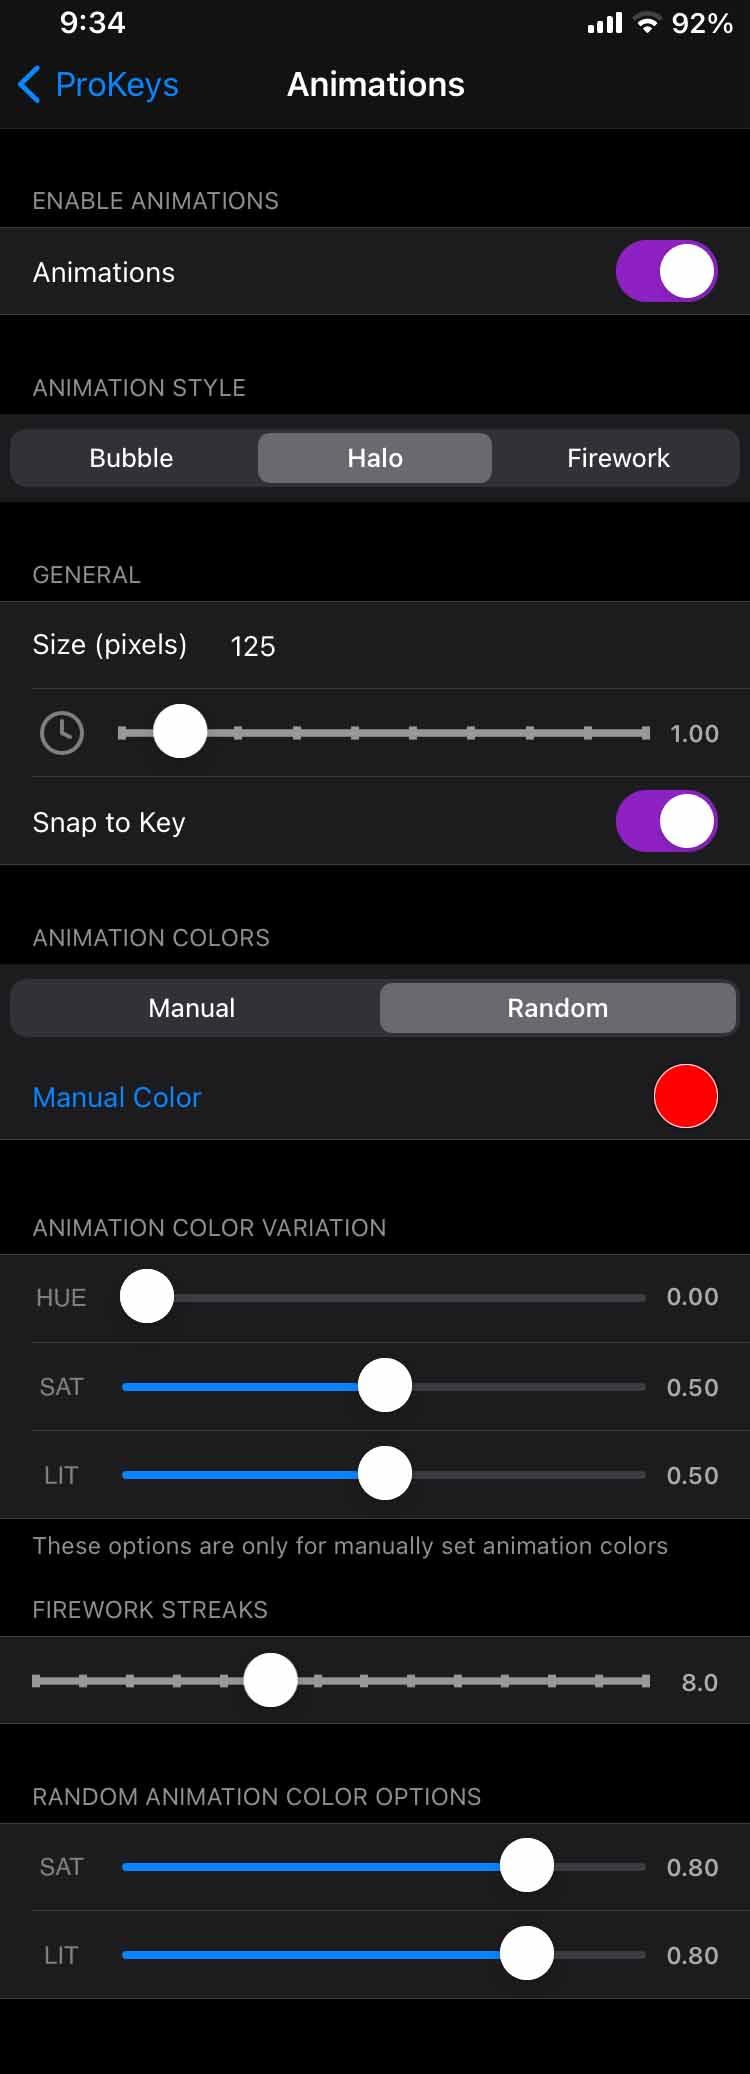 ProKeys Animation Settings